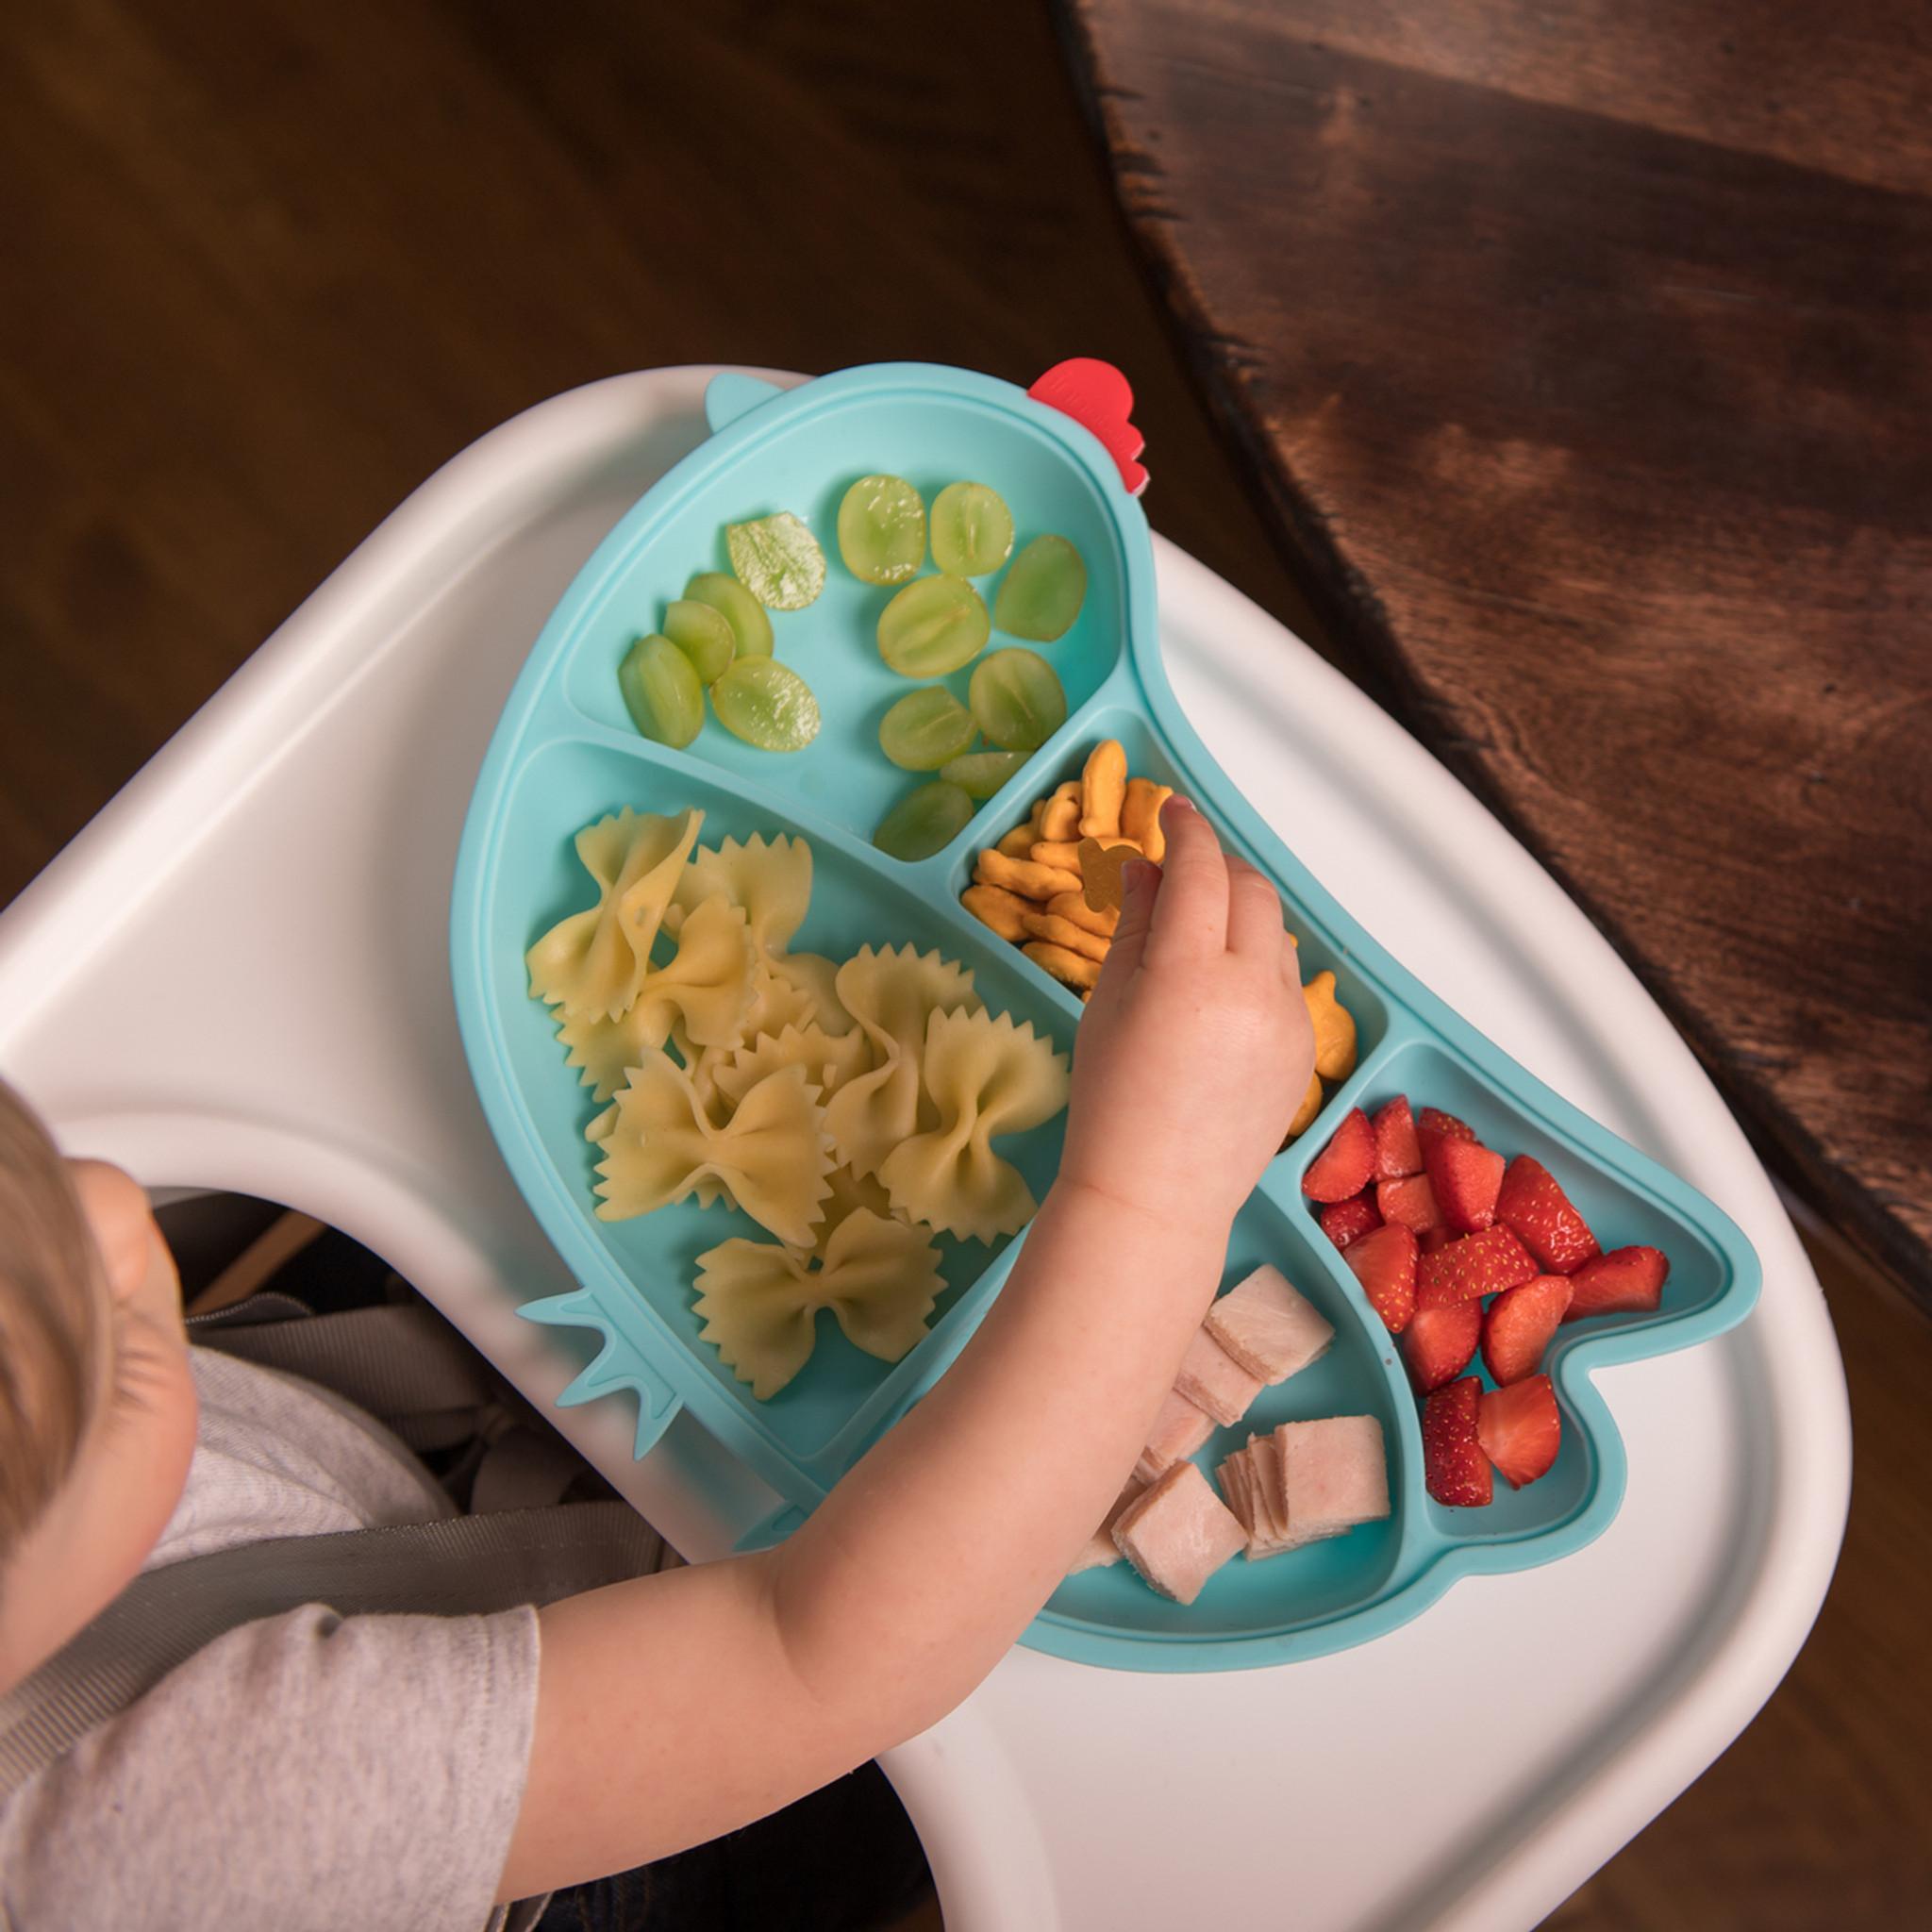 Kids Dinner Plate Divided Dish Tray Baby Food Feeding Tableware J